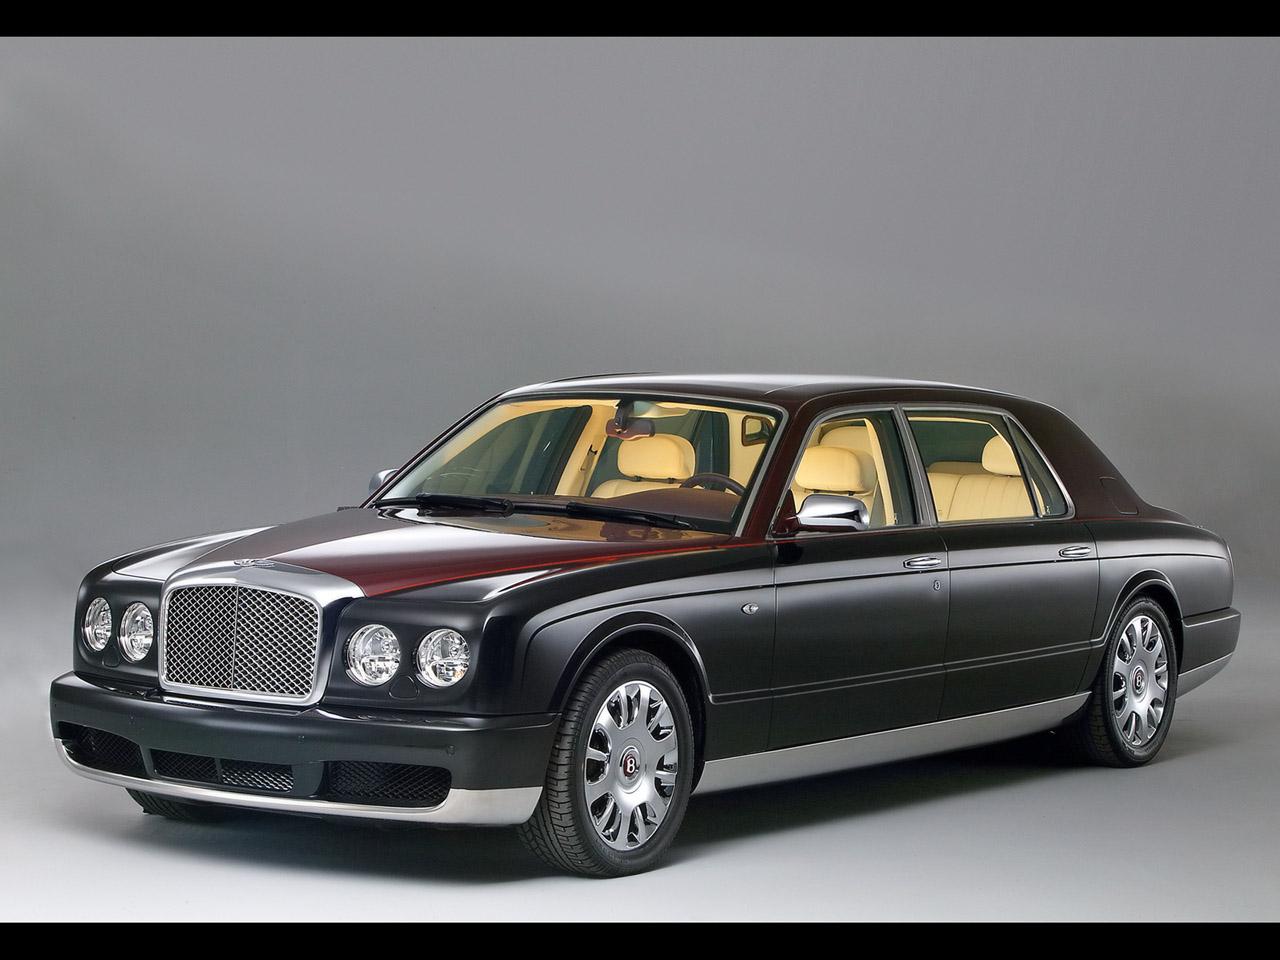 Bentley Arnage I 1998 - 2004 Sedan #1